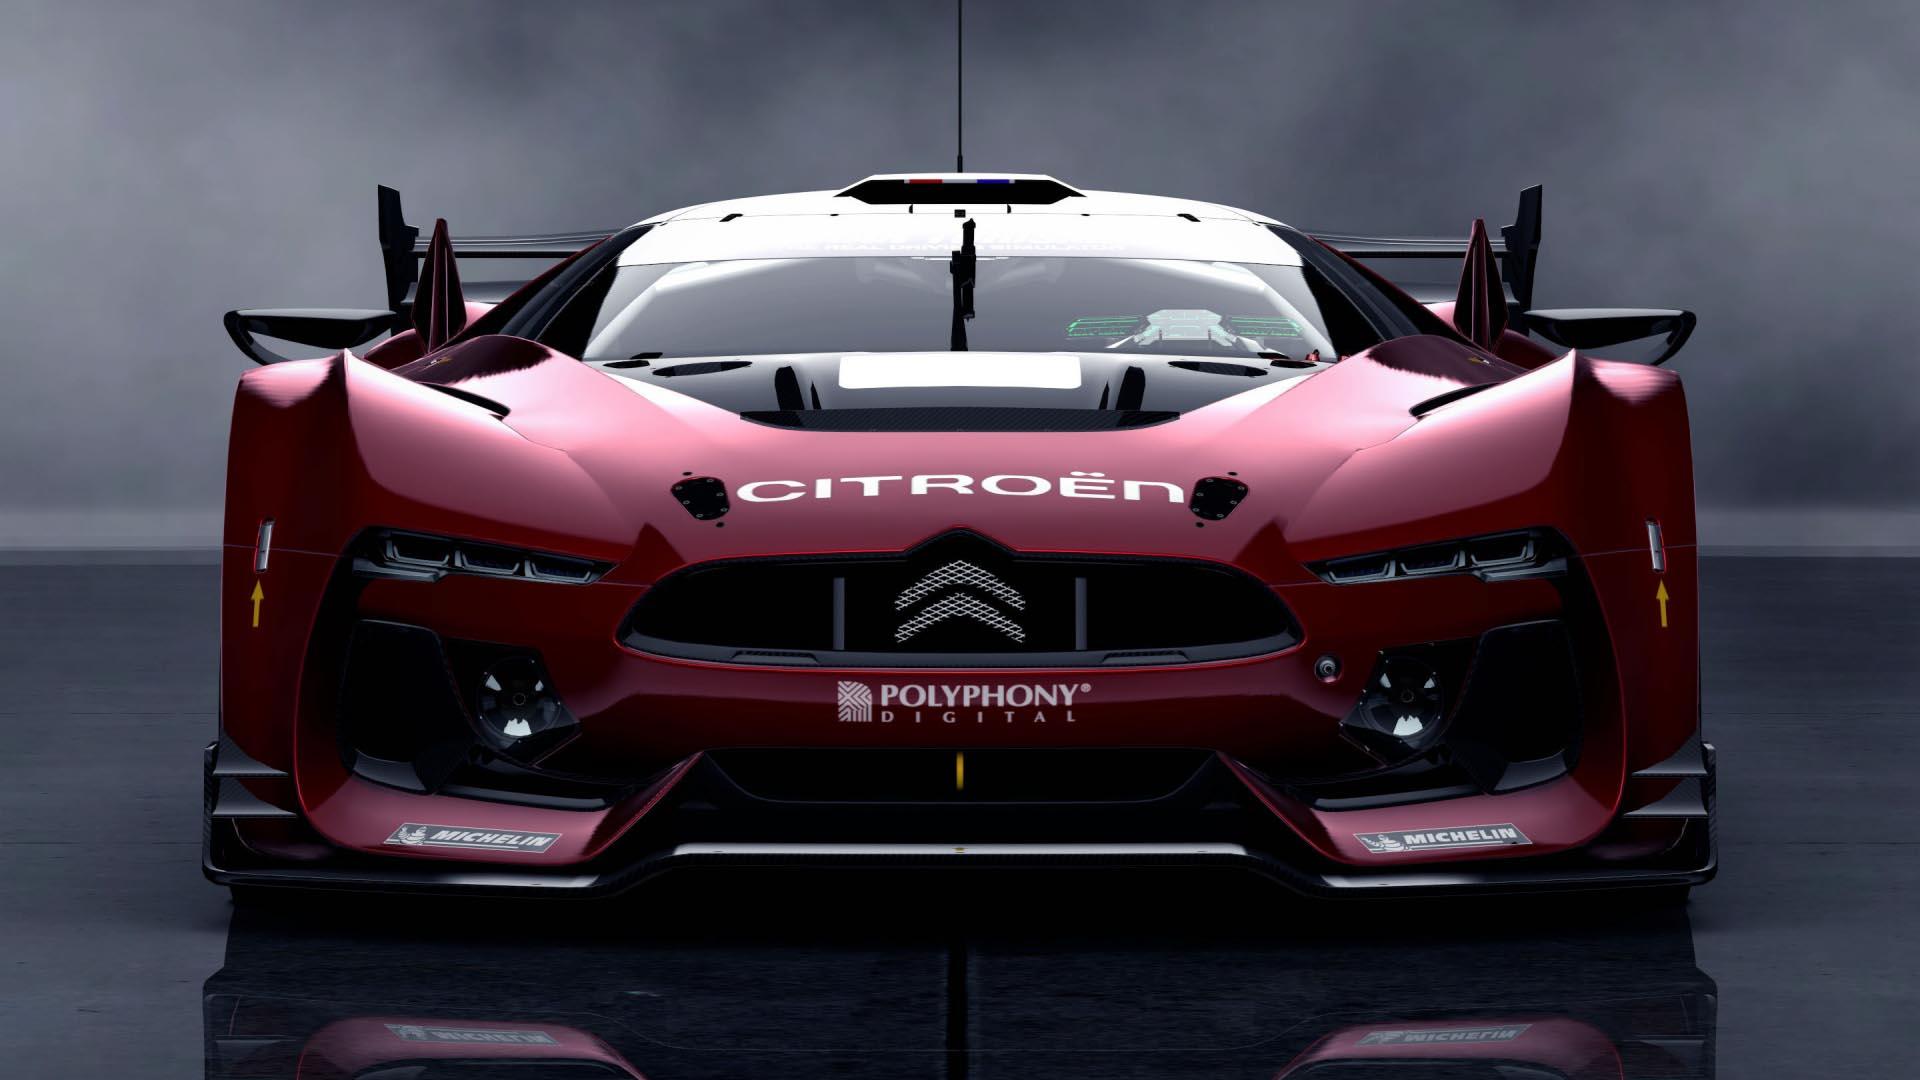 citroen_gt_race_car-1080